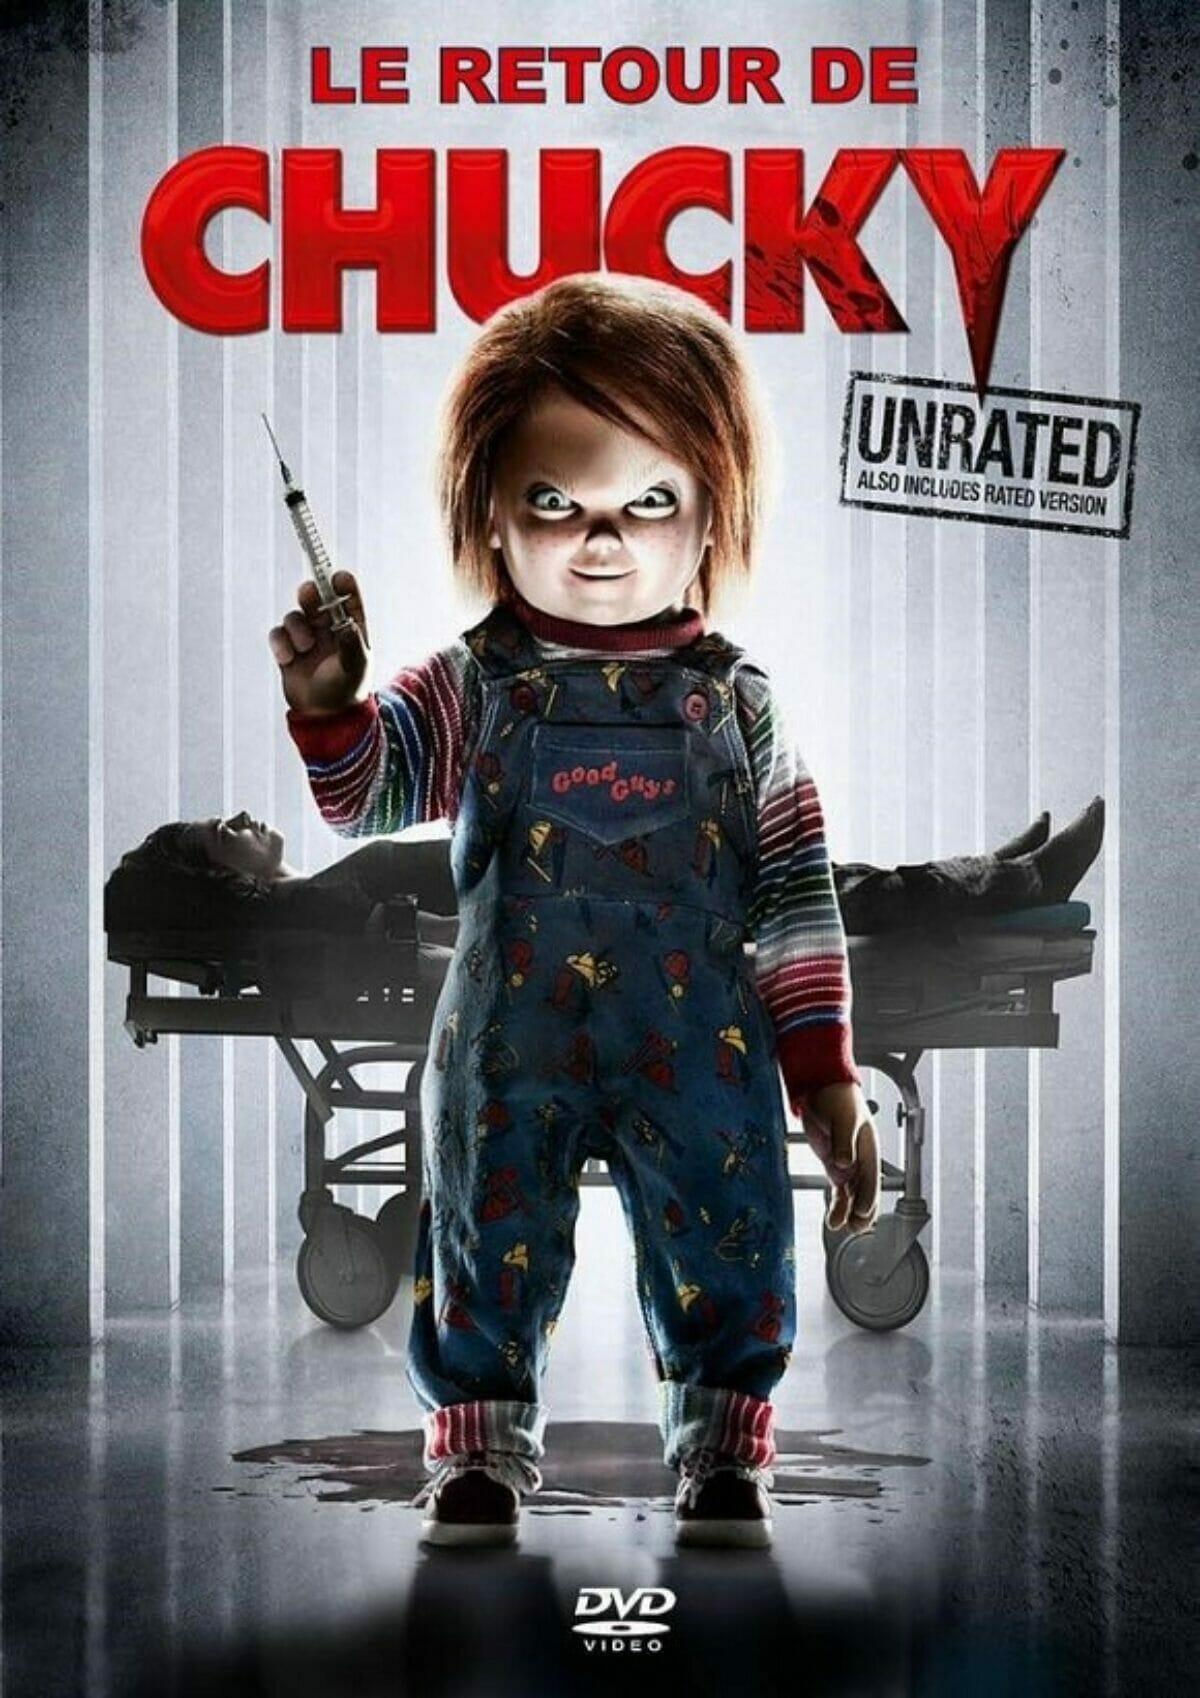 Le_Retour_de_Chucky-poster